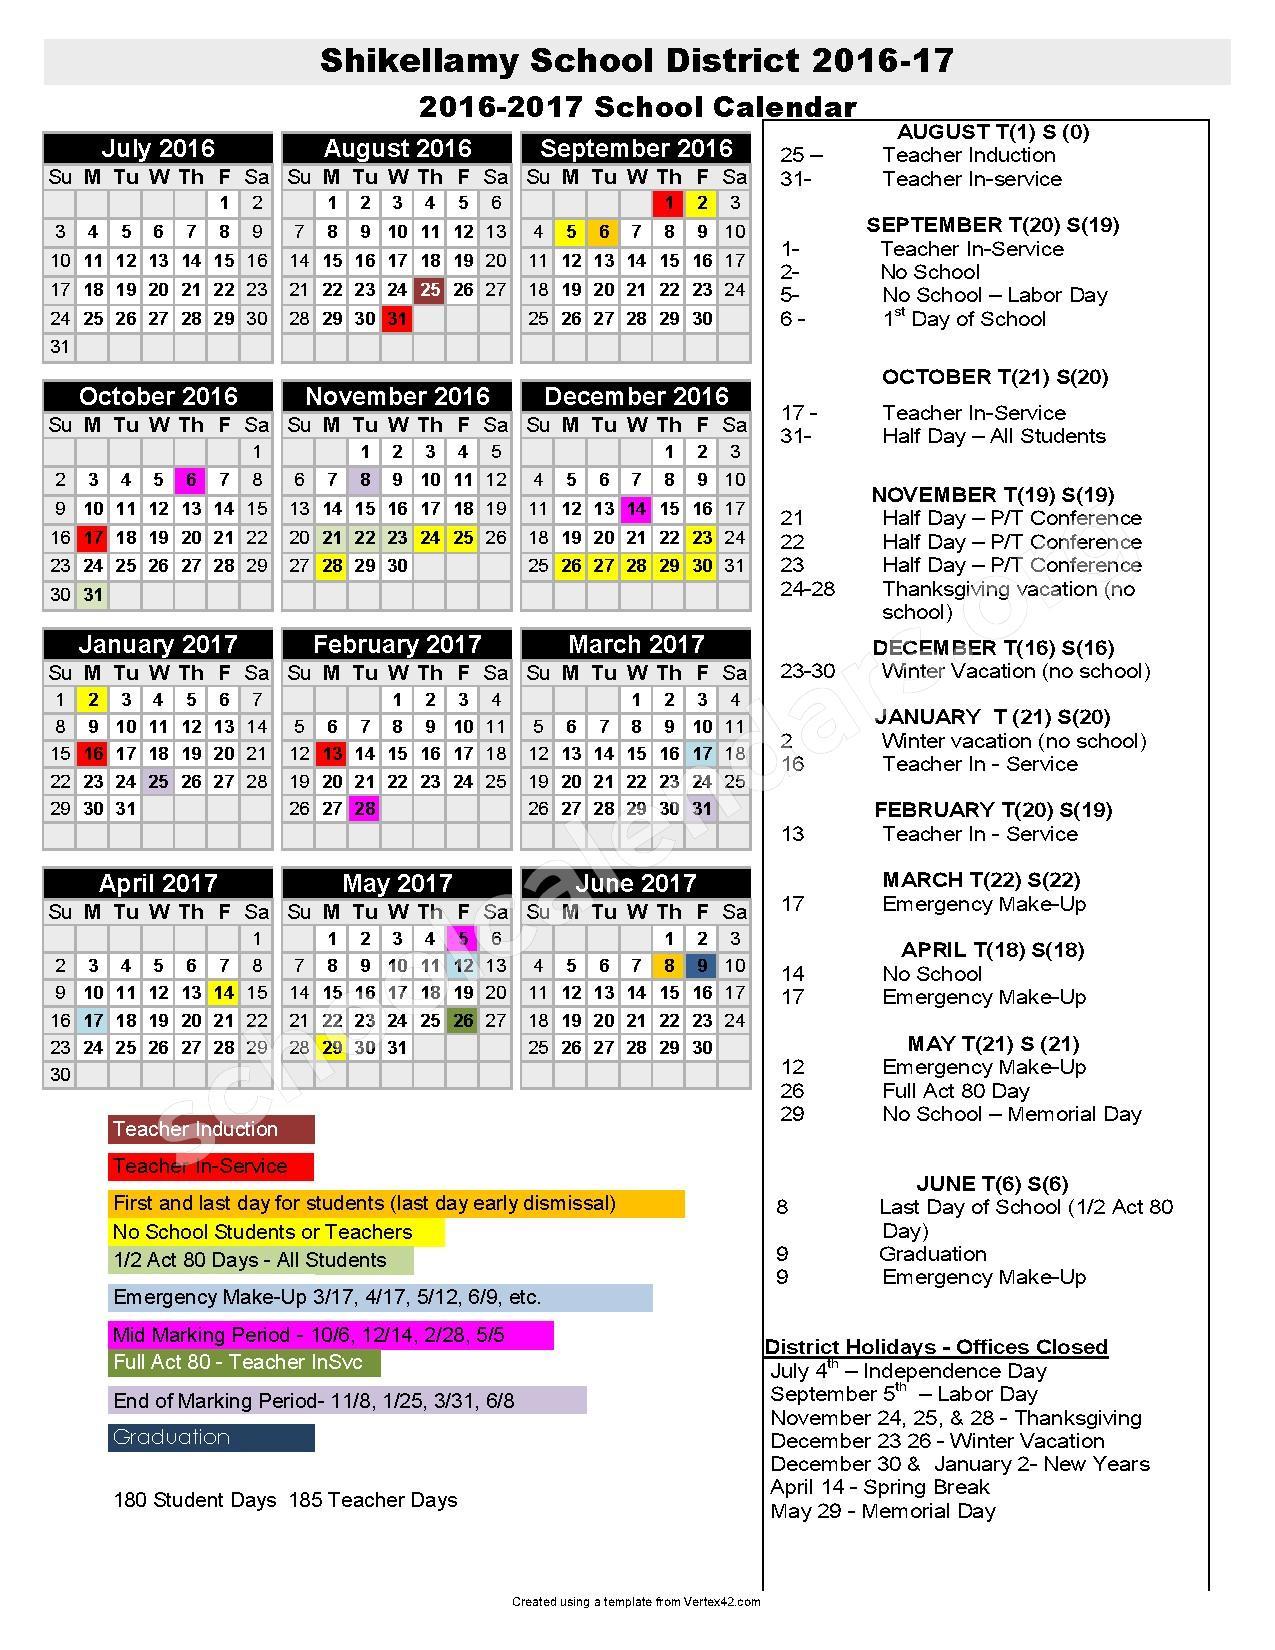 2016 - 2017 District Calendar   Shikellamy School District with Vertex Academic Calendar